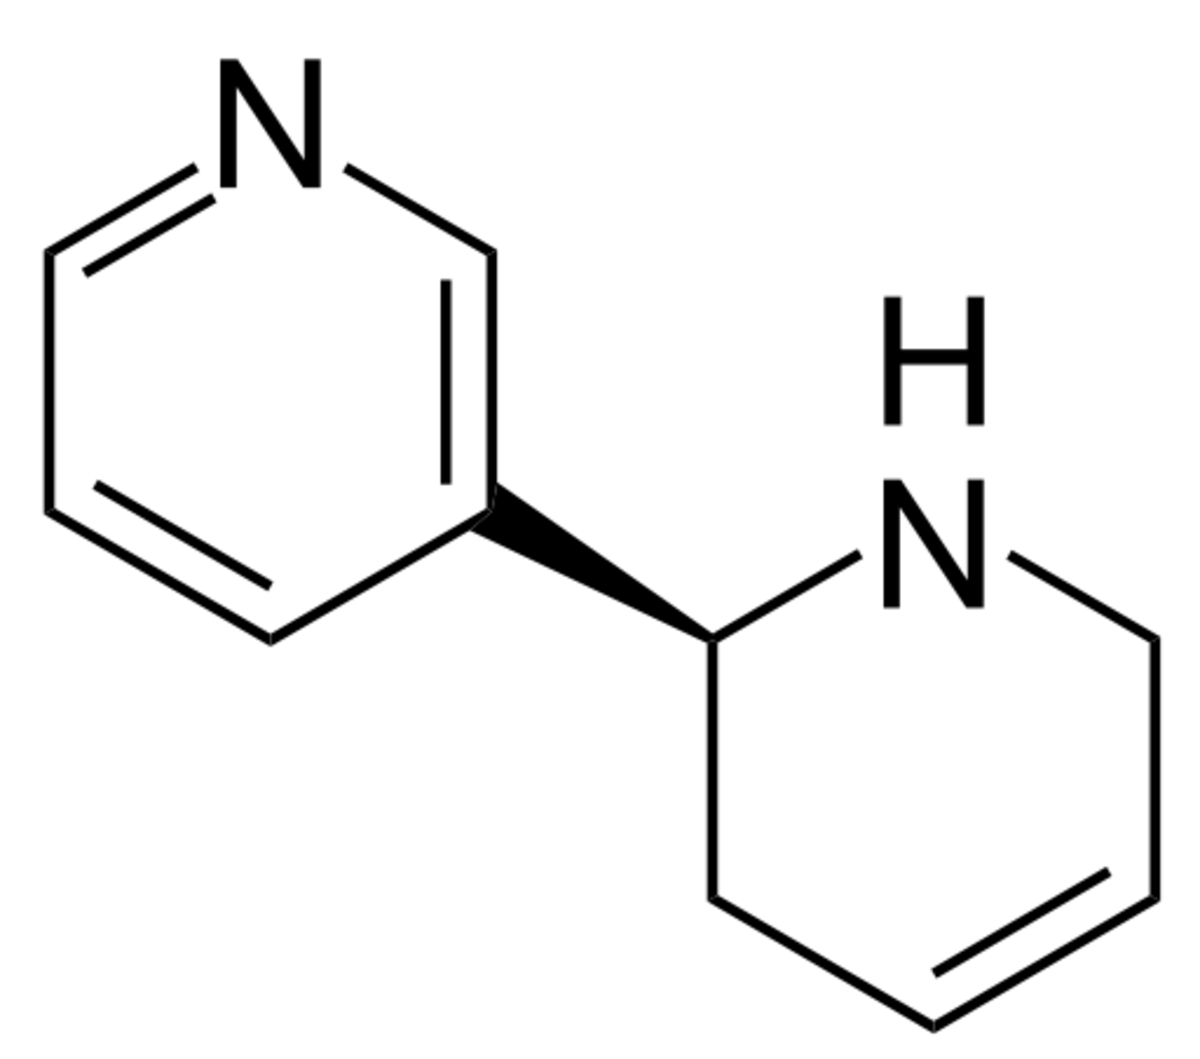 Molecular Structure of Anatabine